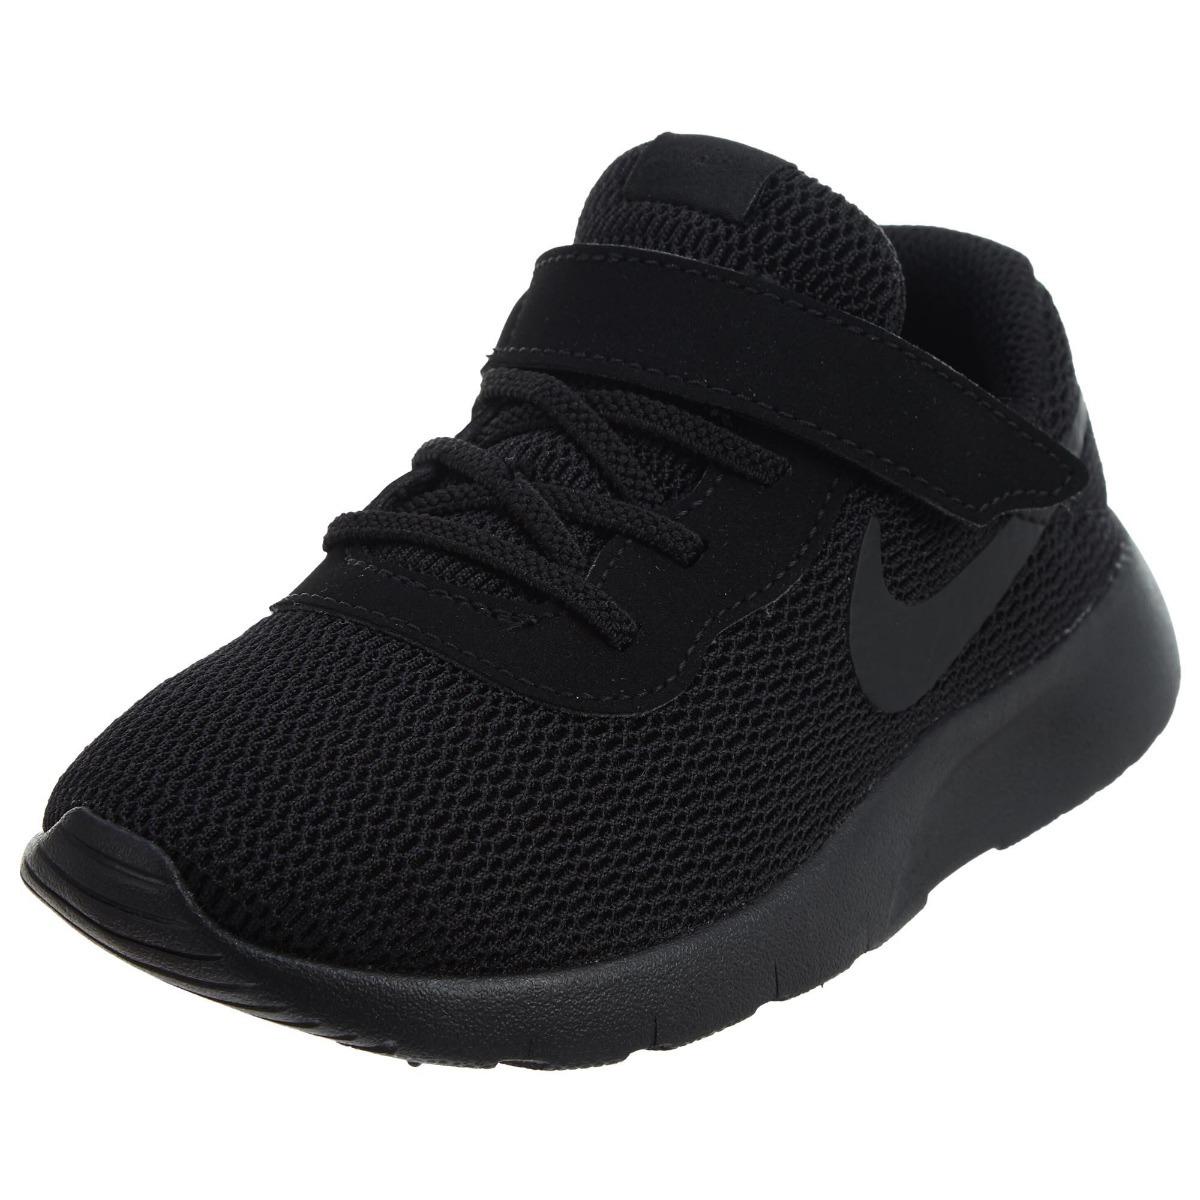 2019 mejor venta venta caliente online liberar información sobre Tenis Nike Tanjun Negro Bebe Niño 818383 001